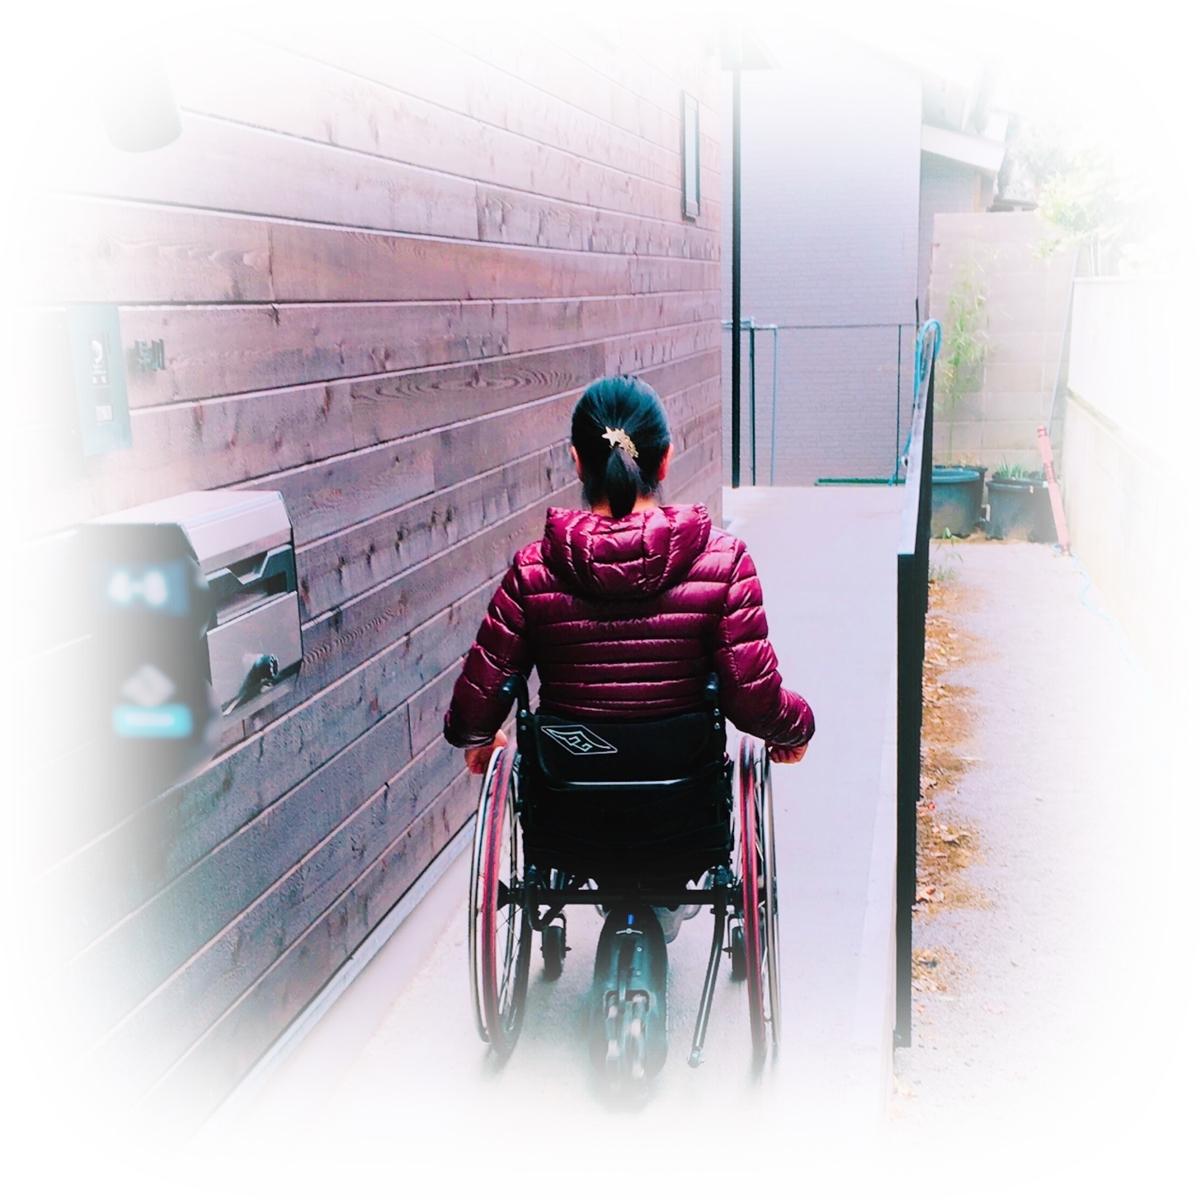 f:id:WheelchairFamily:20190527074254j:plain